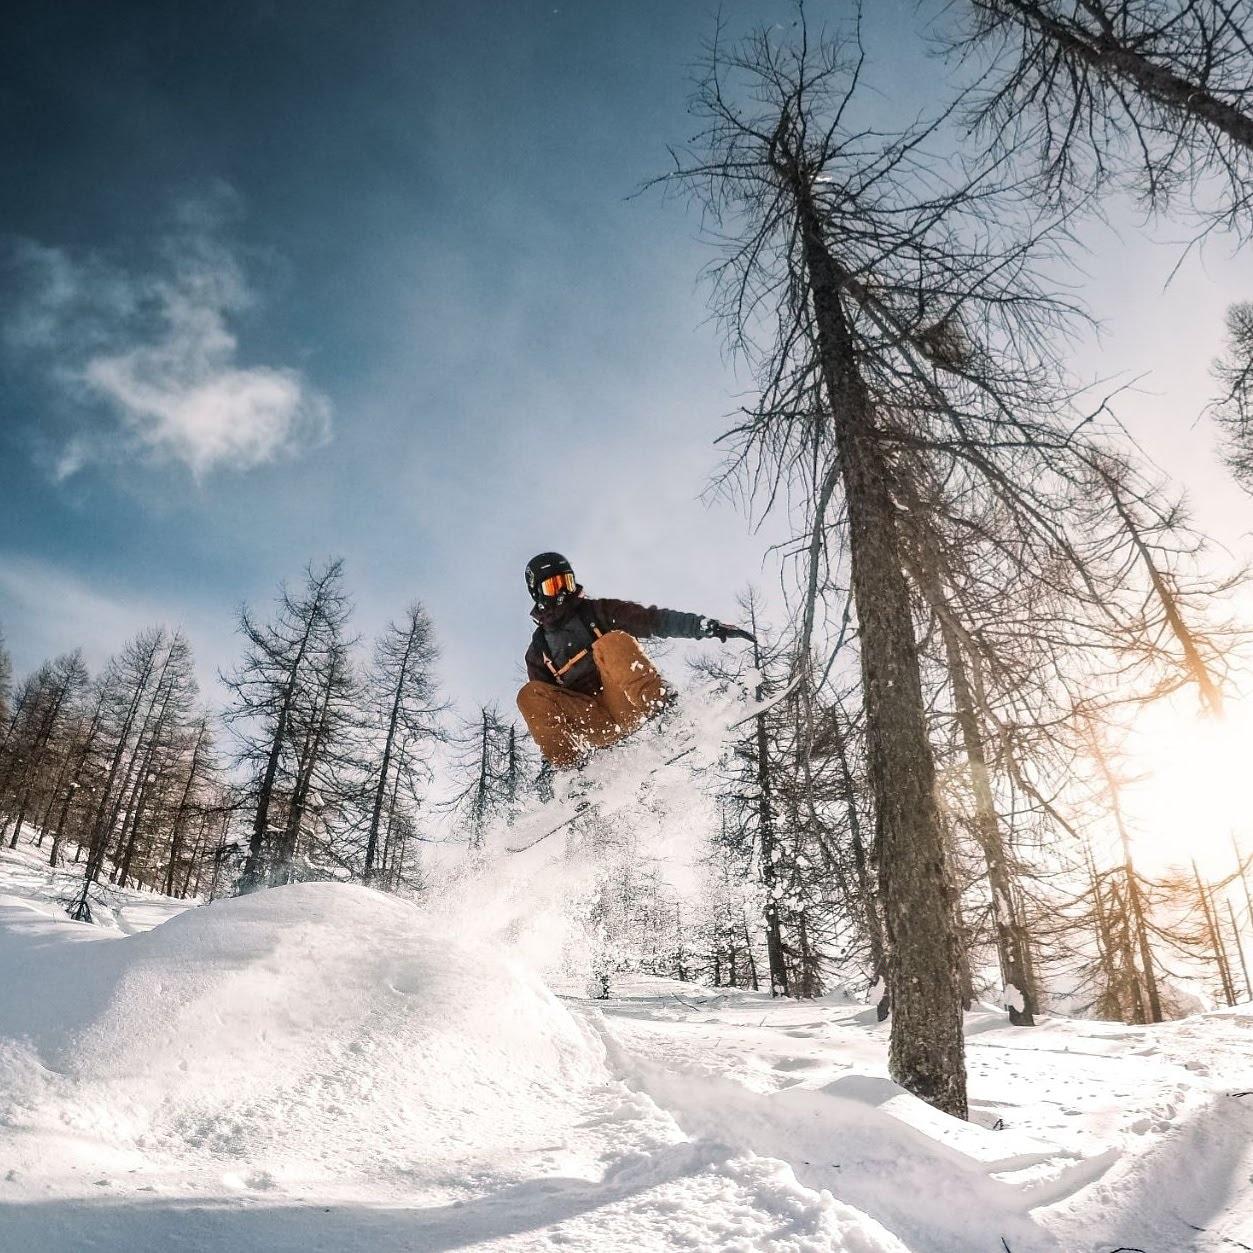 Exciting Winter Sports  - ADVANCED |  Elia Sega